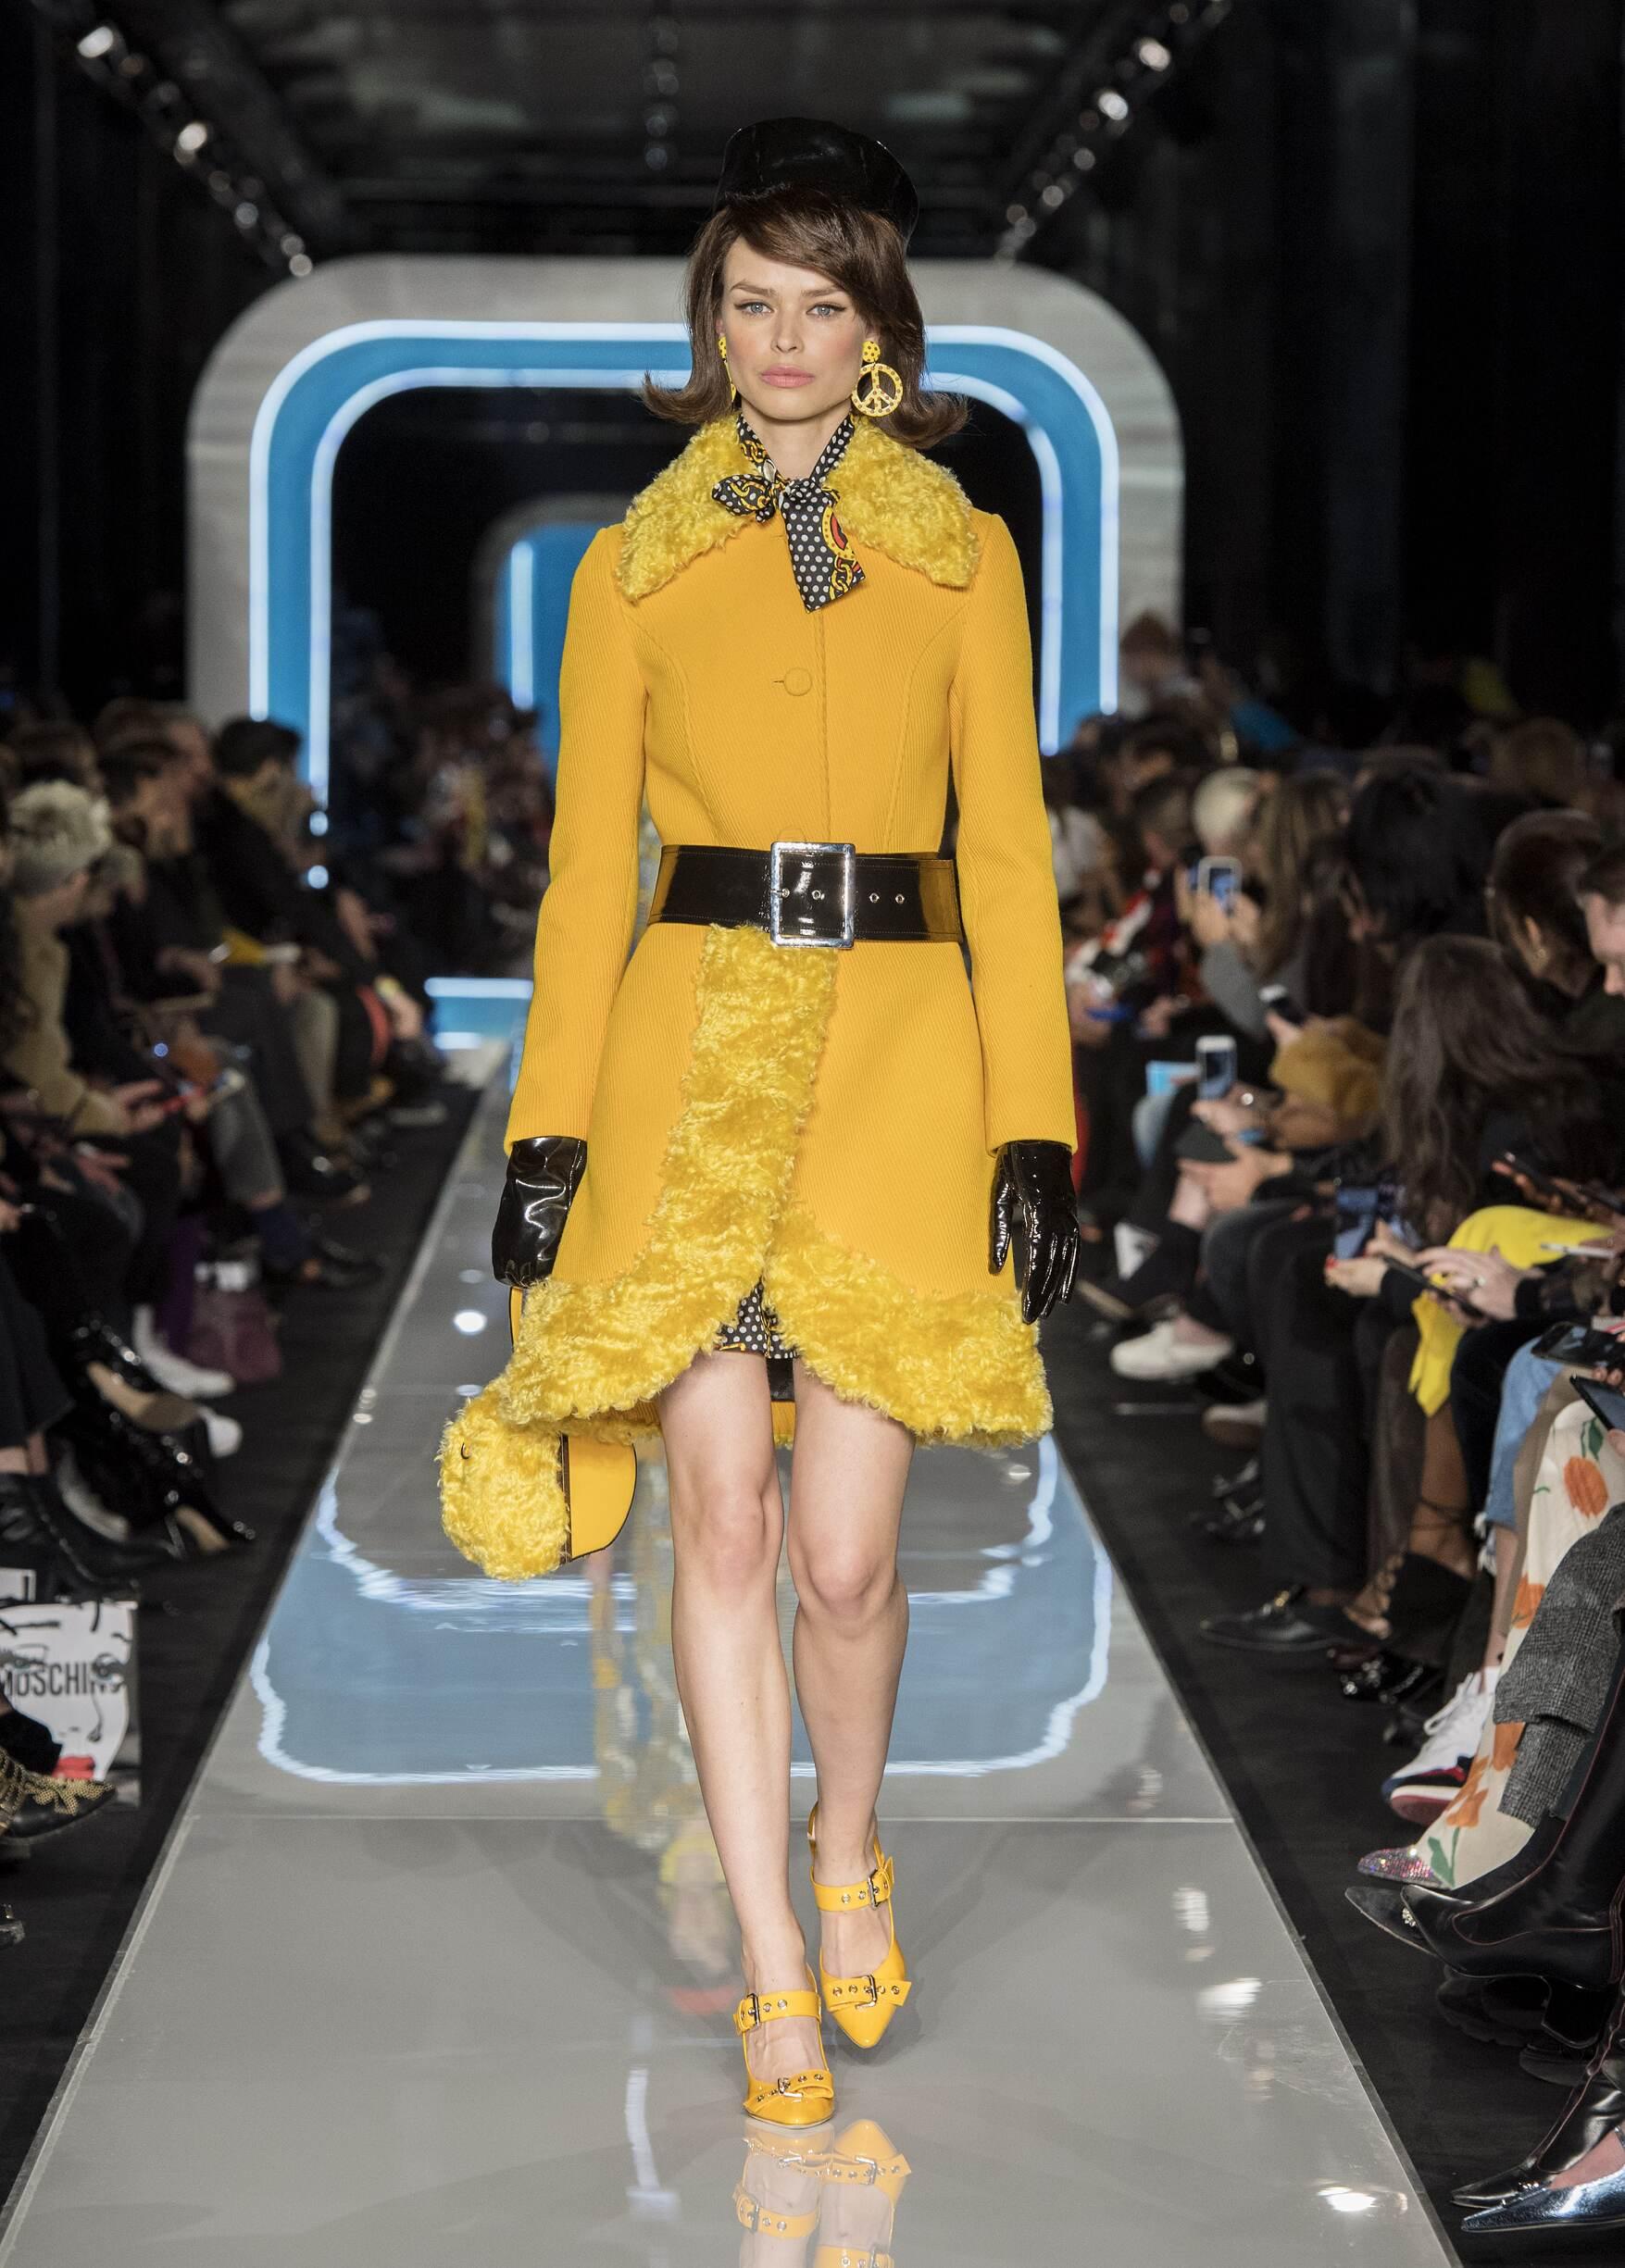 Moschino Winter 2018 Woman Catwalk